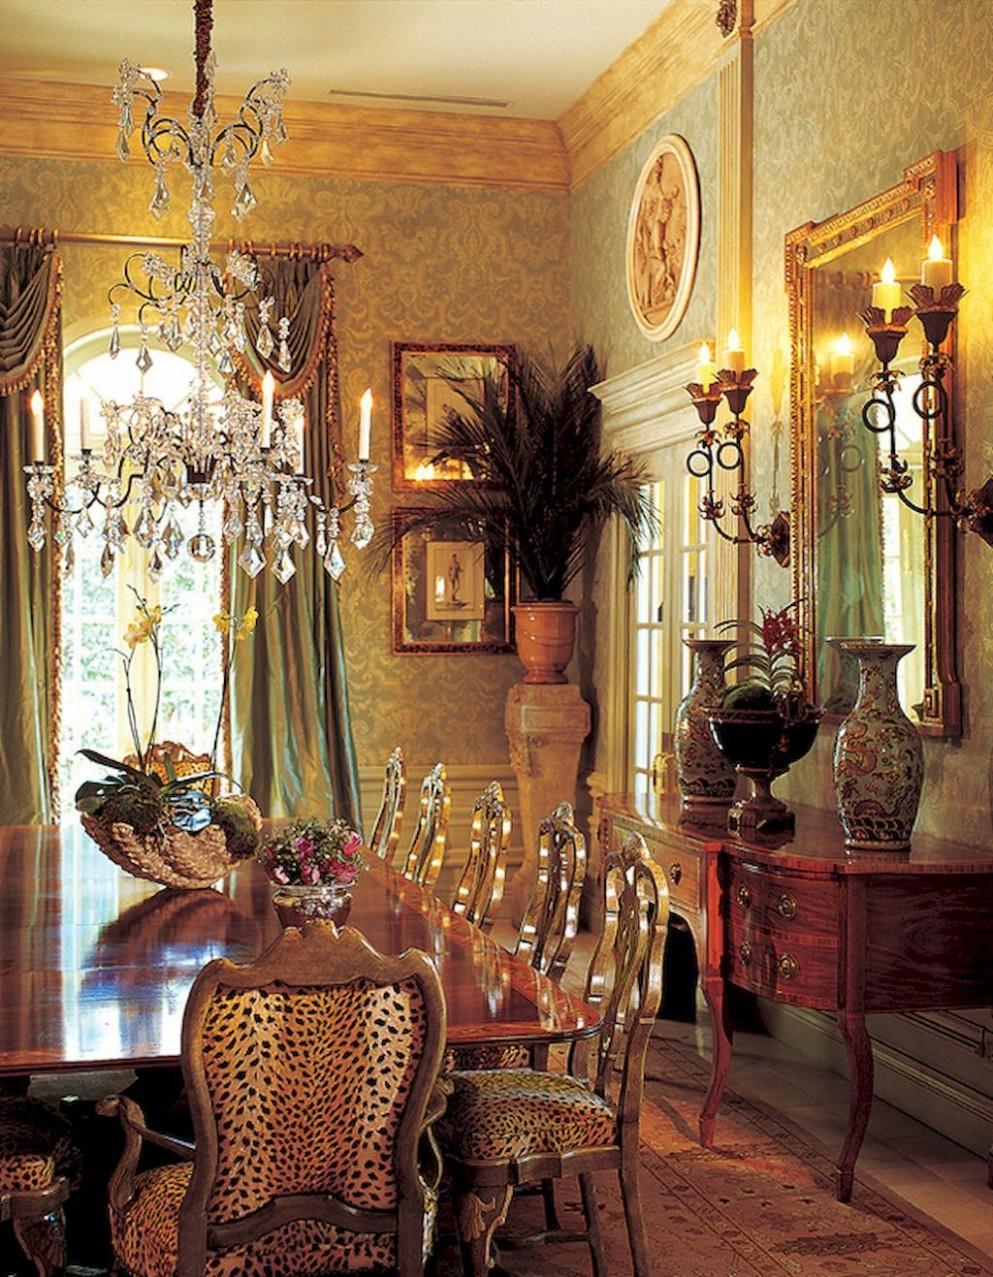 8 vintage victorian dining room decor ideas (8)  Victorian  - Dining Room Ideas Victorian